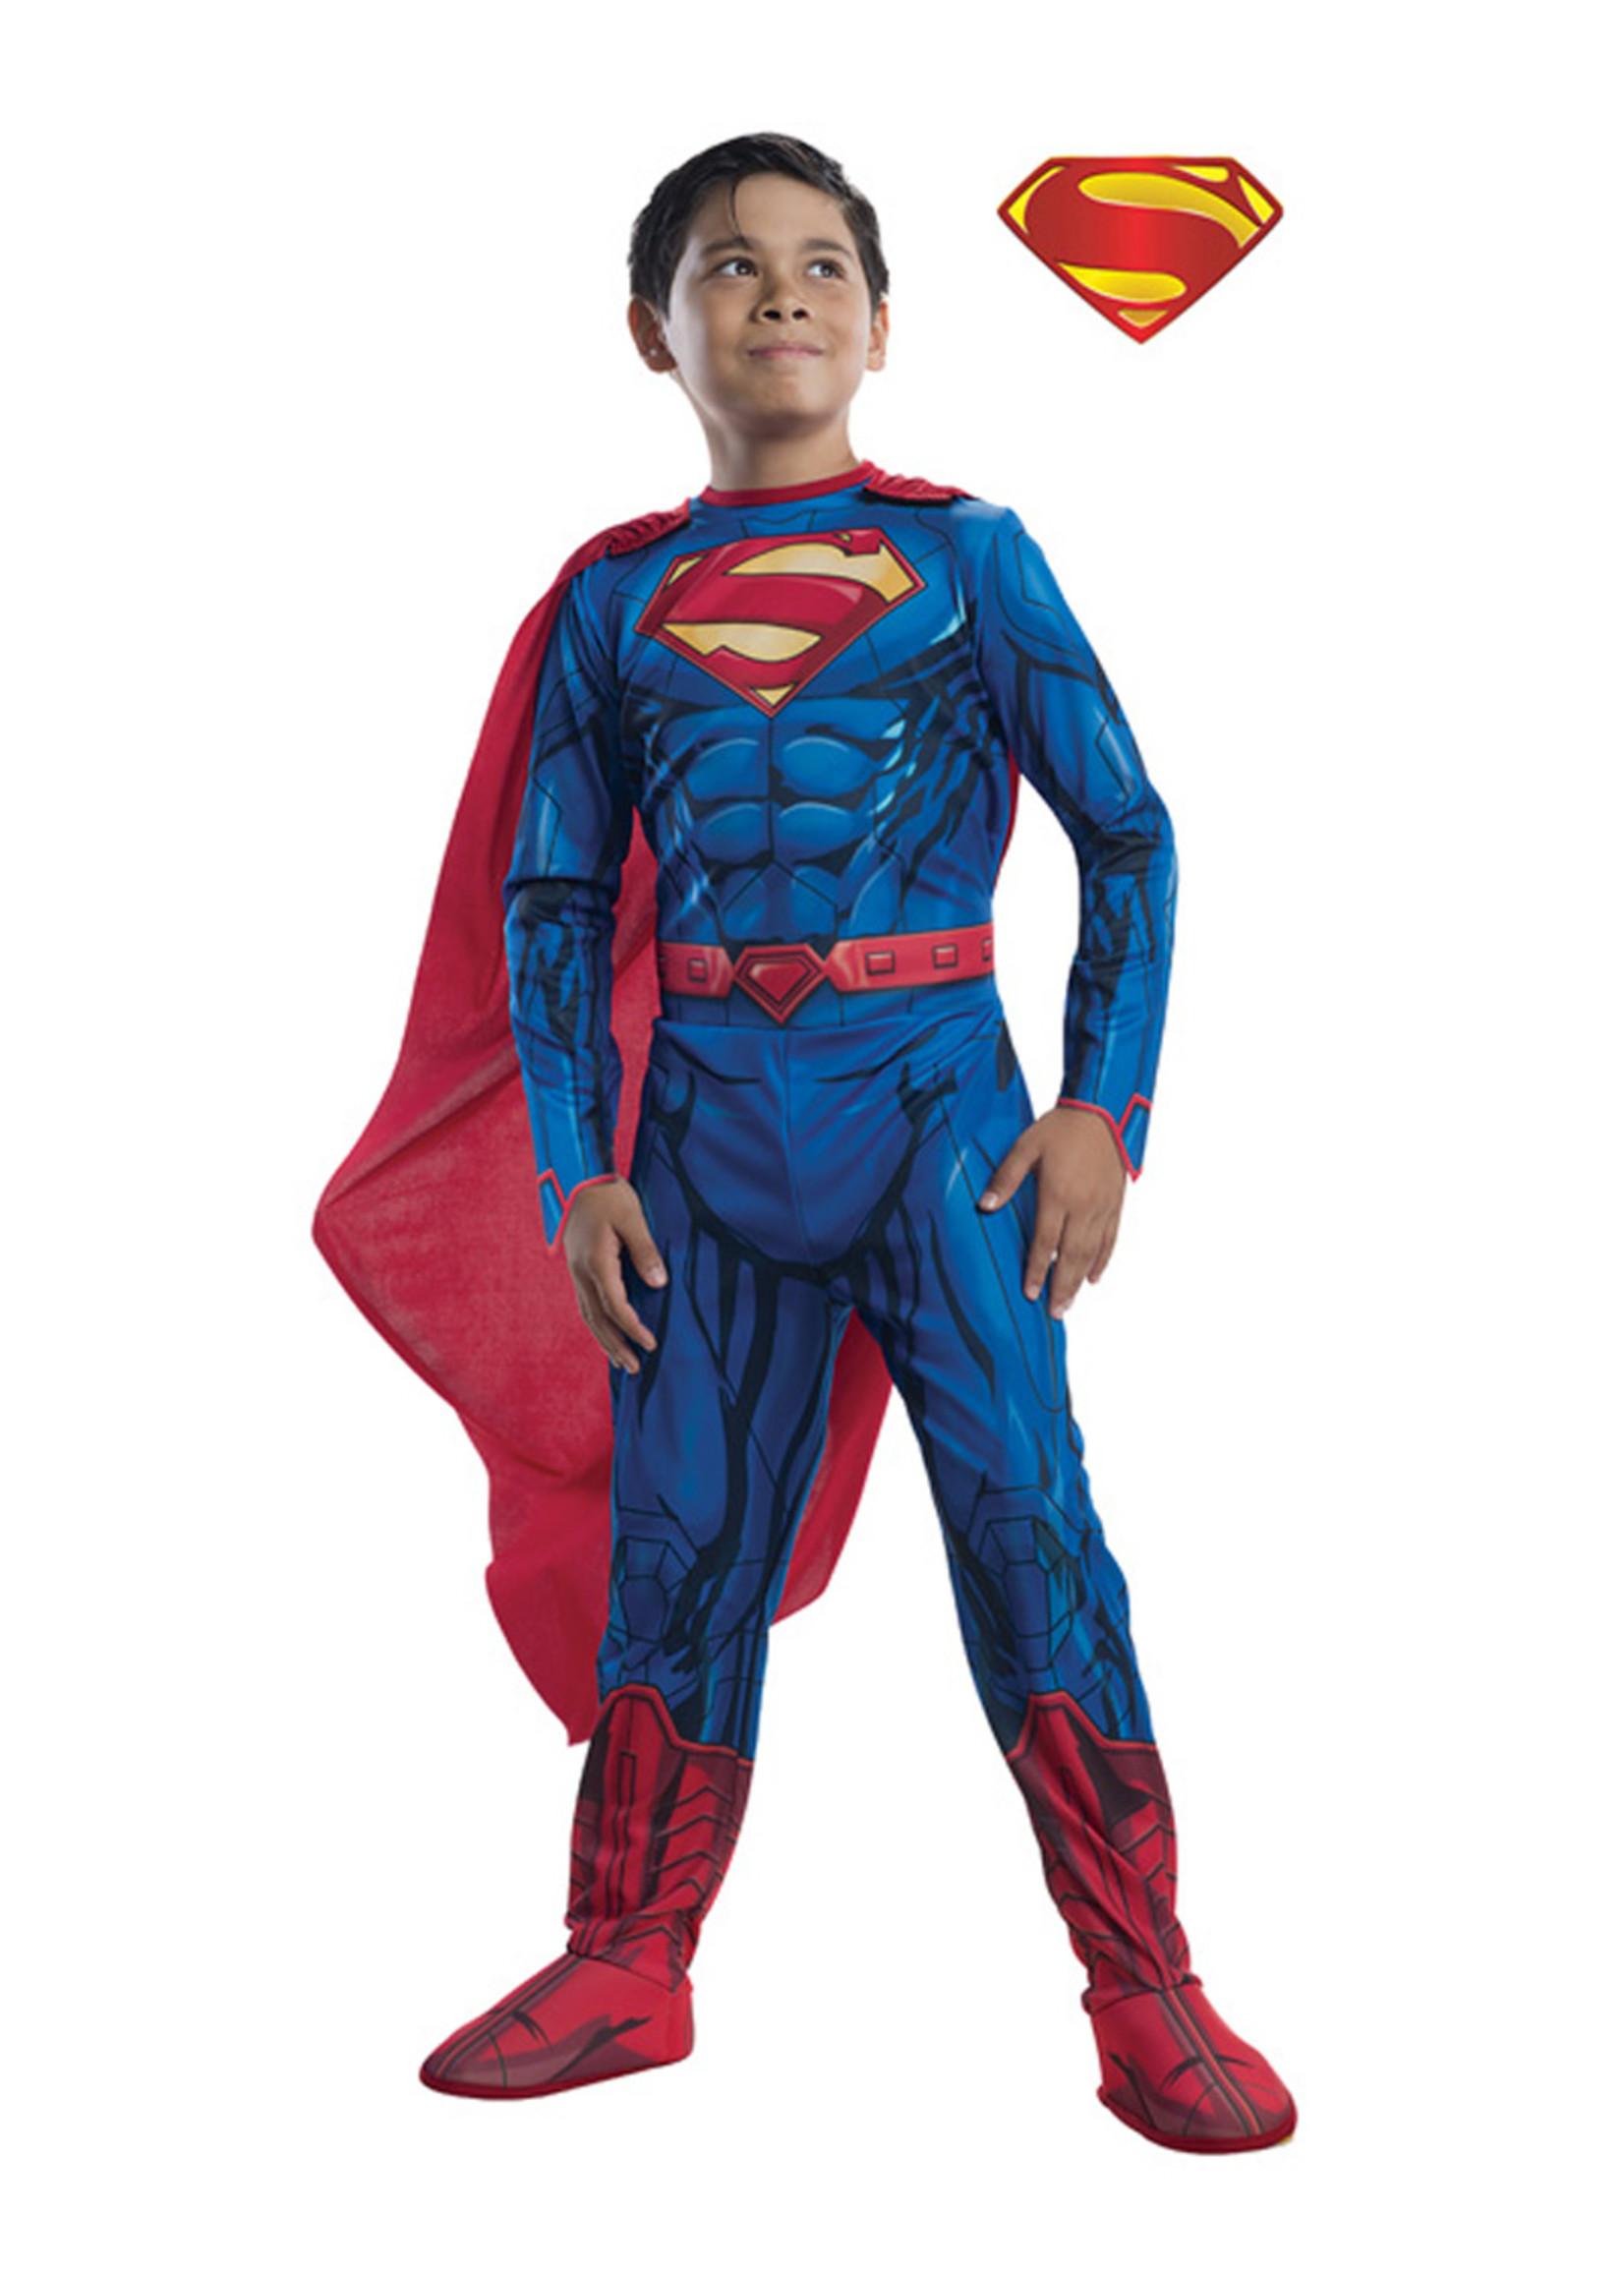 Superman Costume - Boys